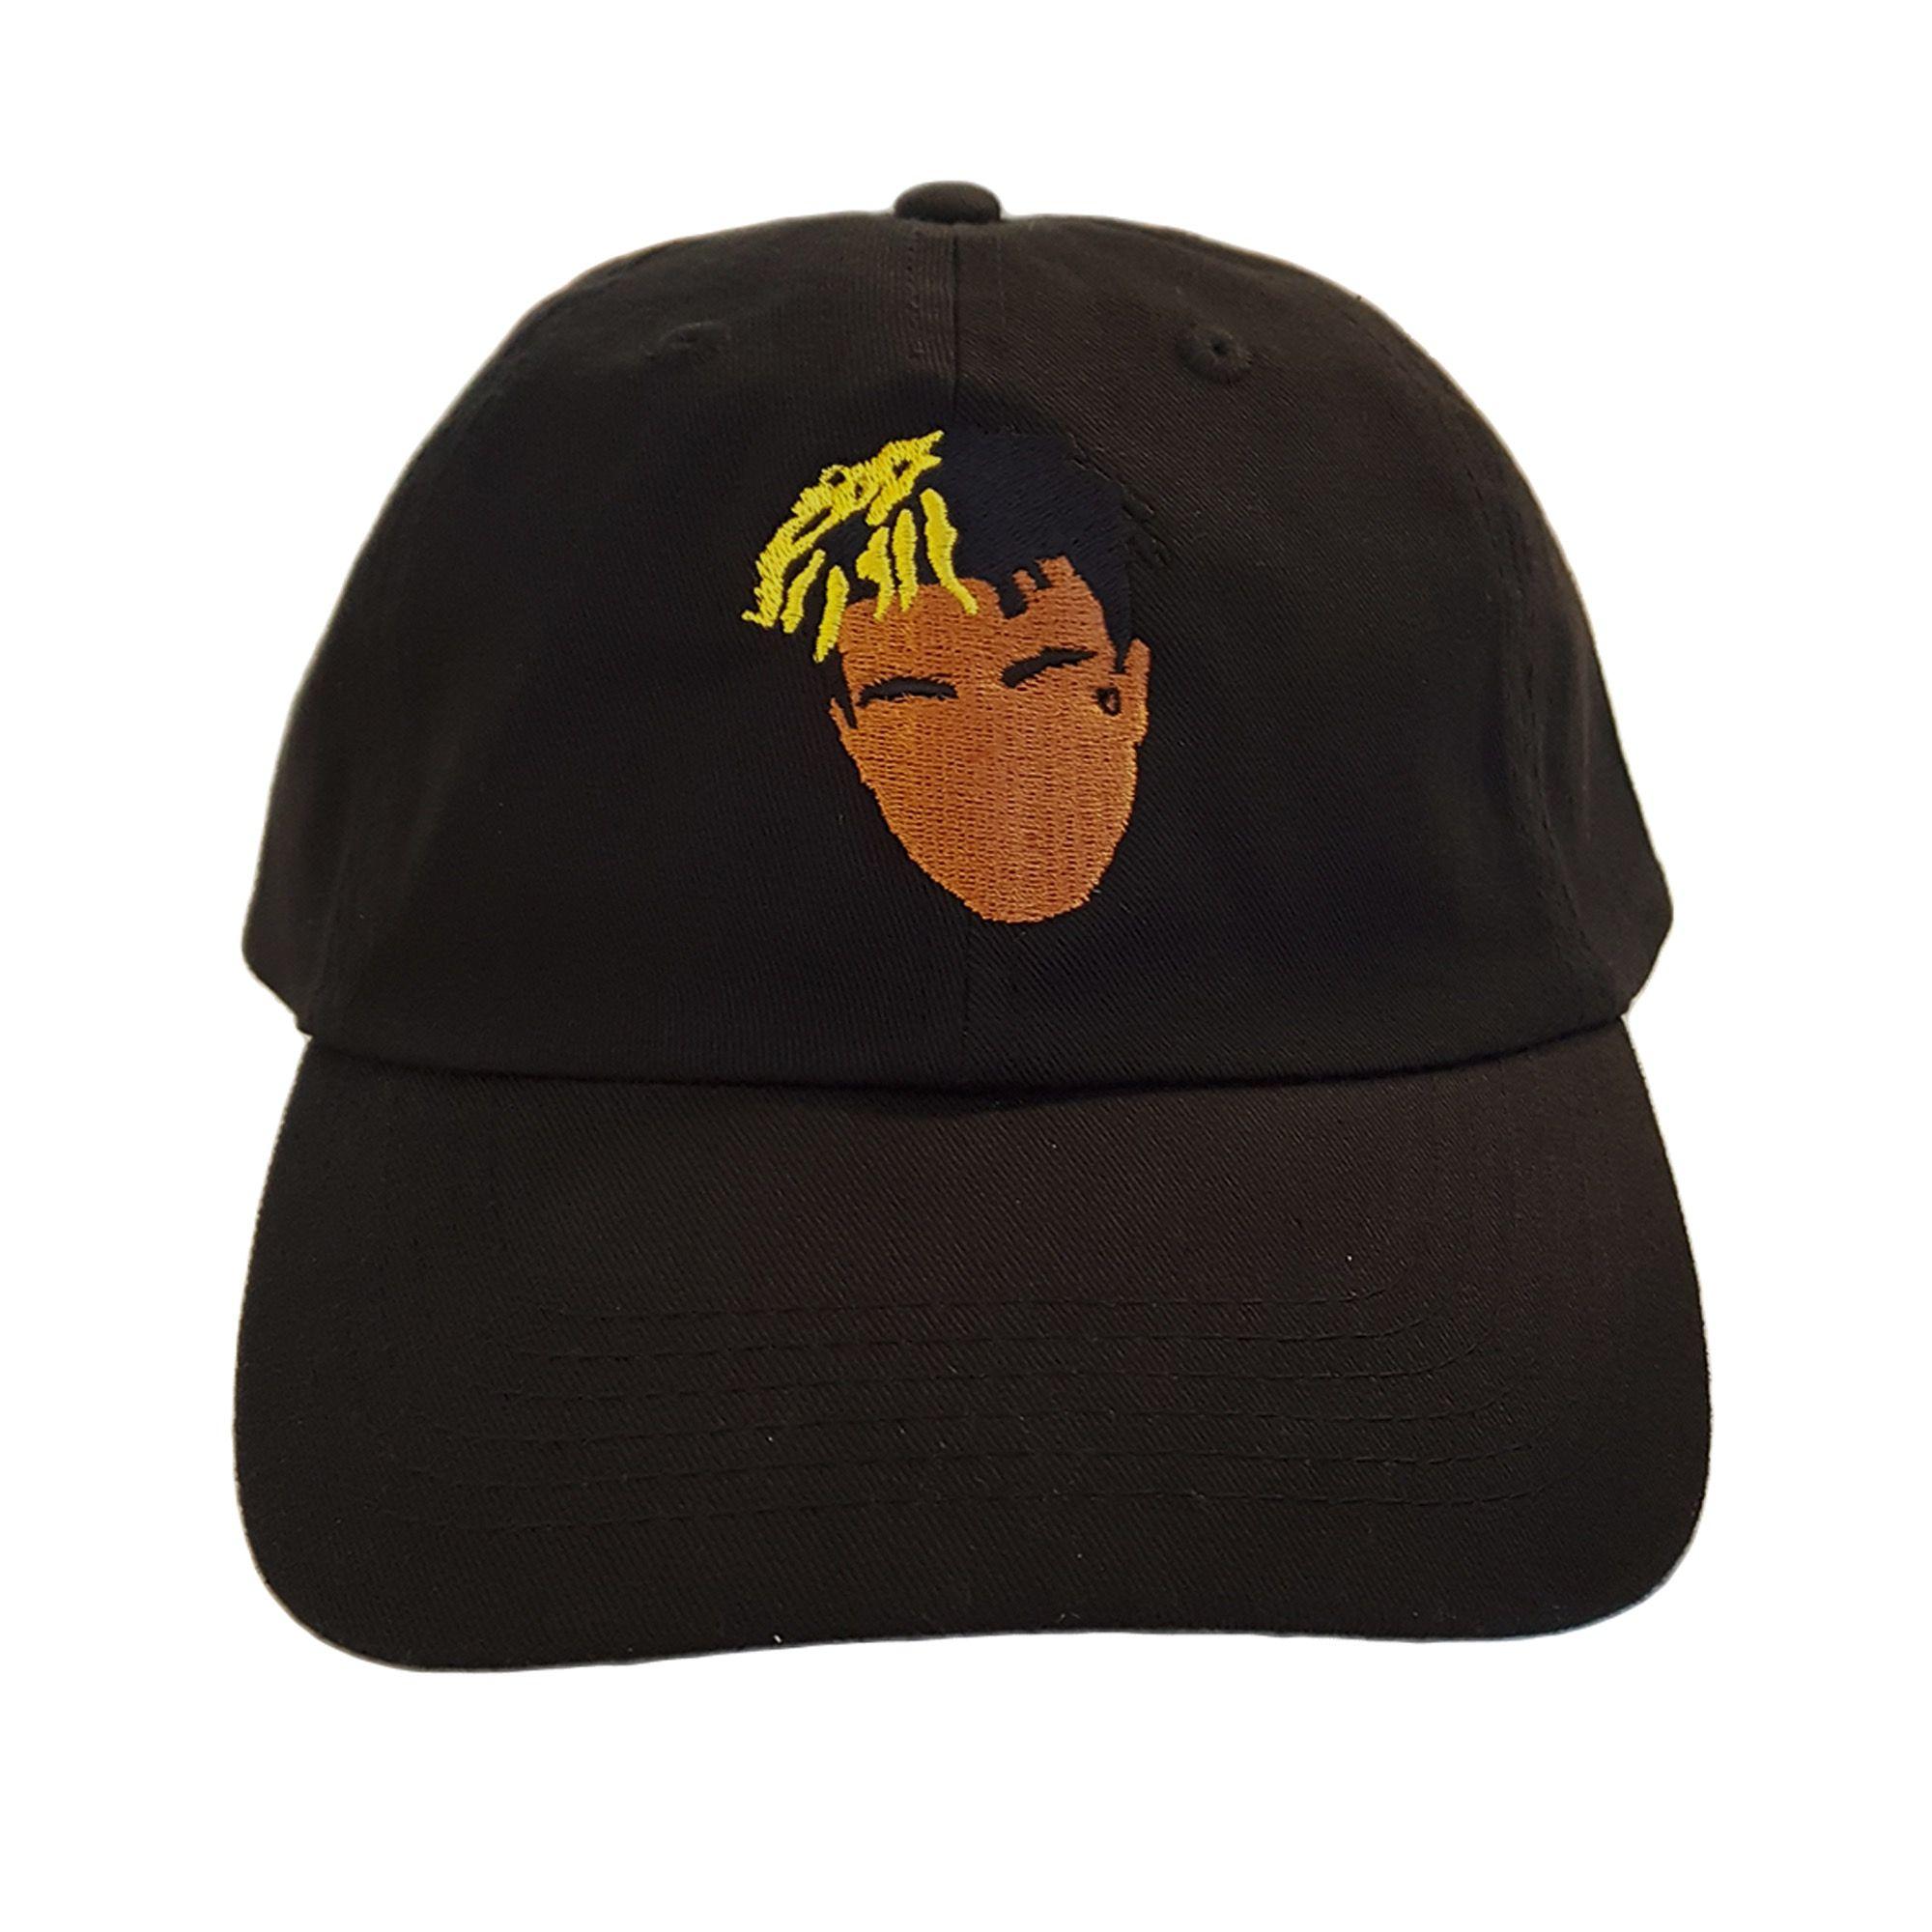 02cdaaef06c Xxxtentacion hat